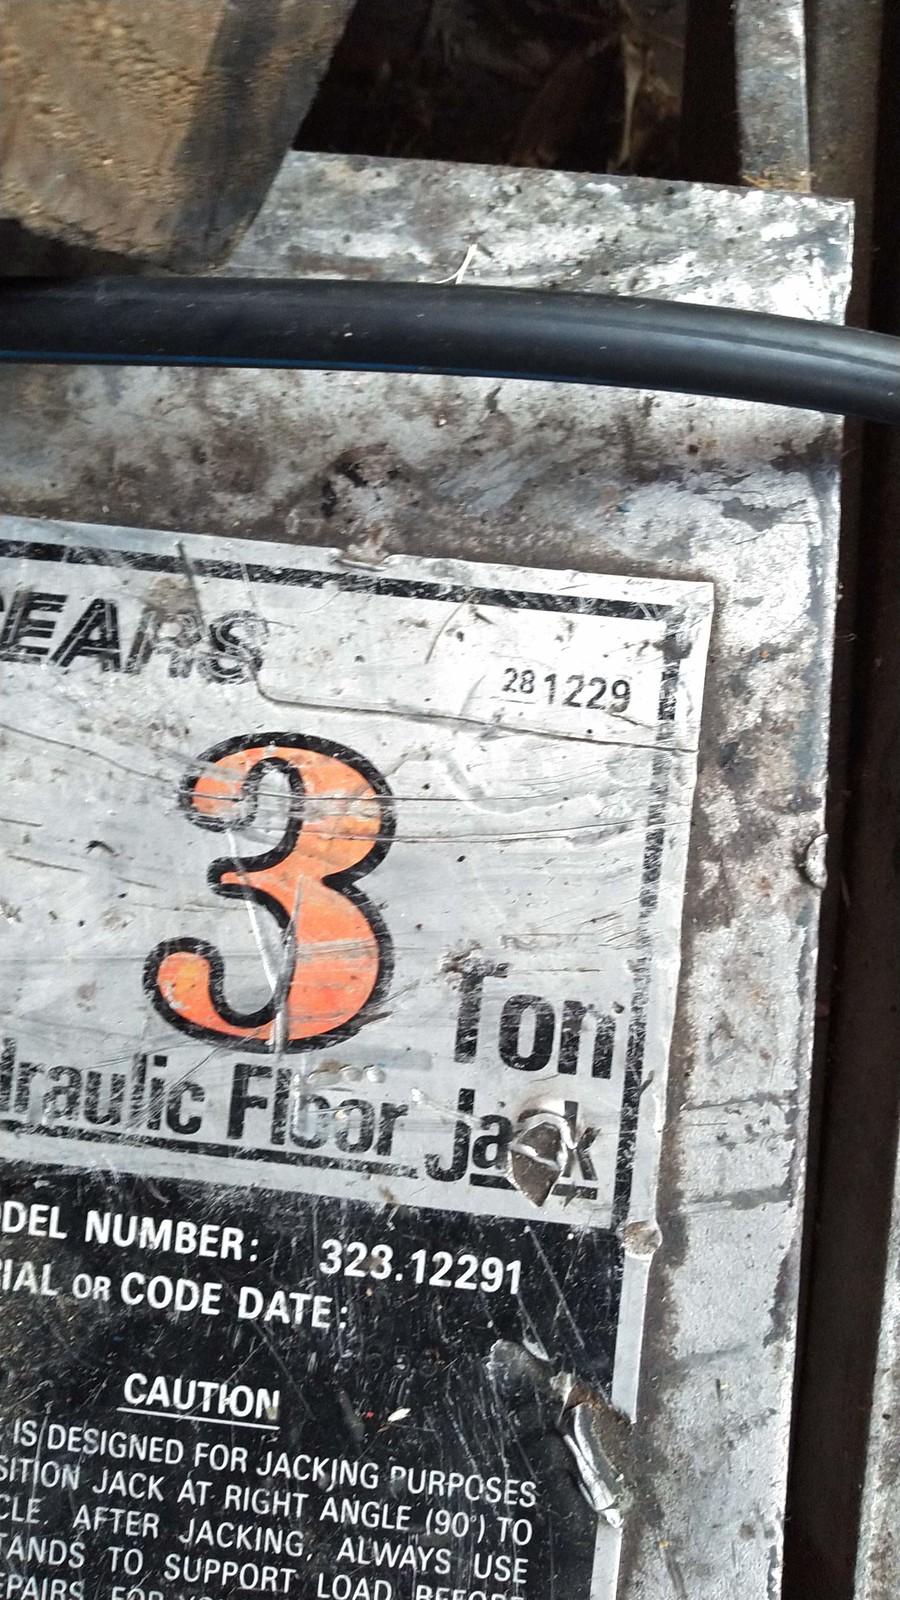 328.12291 Sears Craftsman Floor Jack 3 Ton Seal Replacement Kit